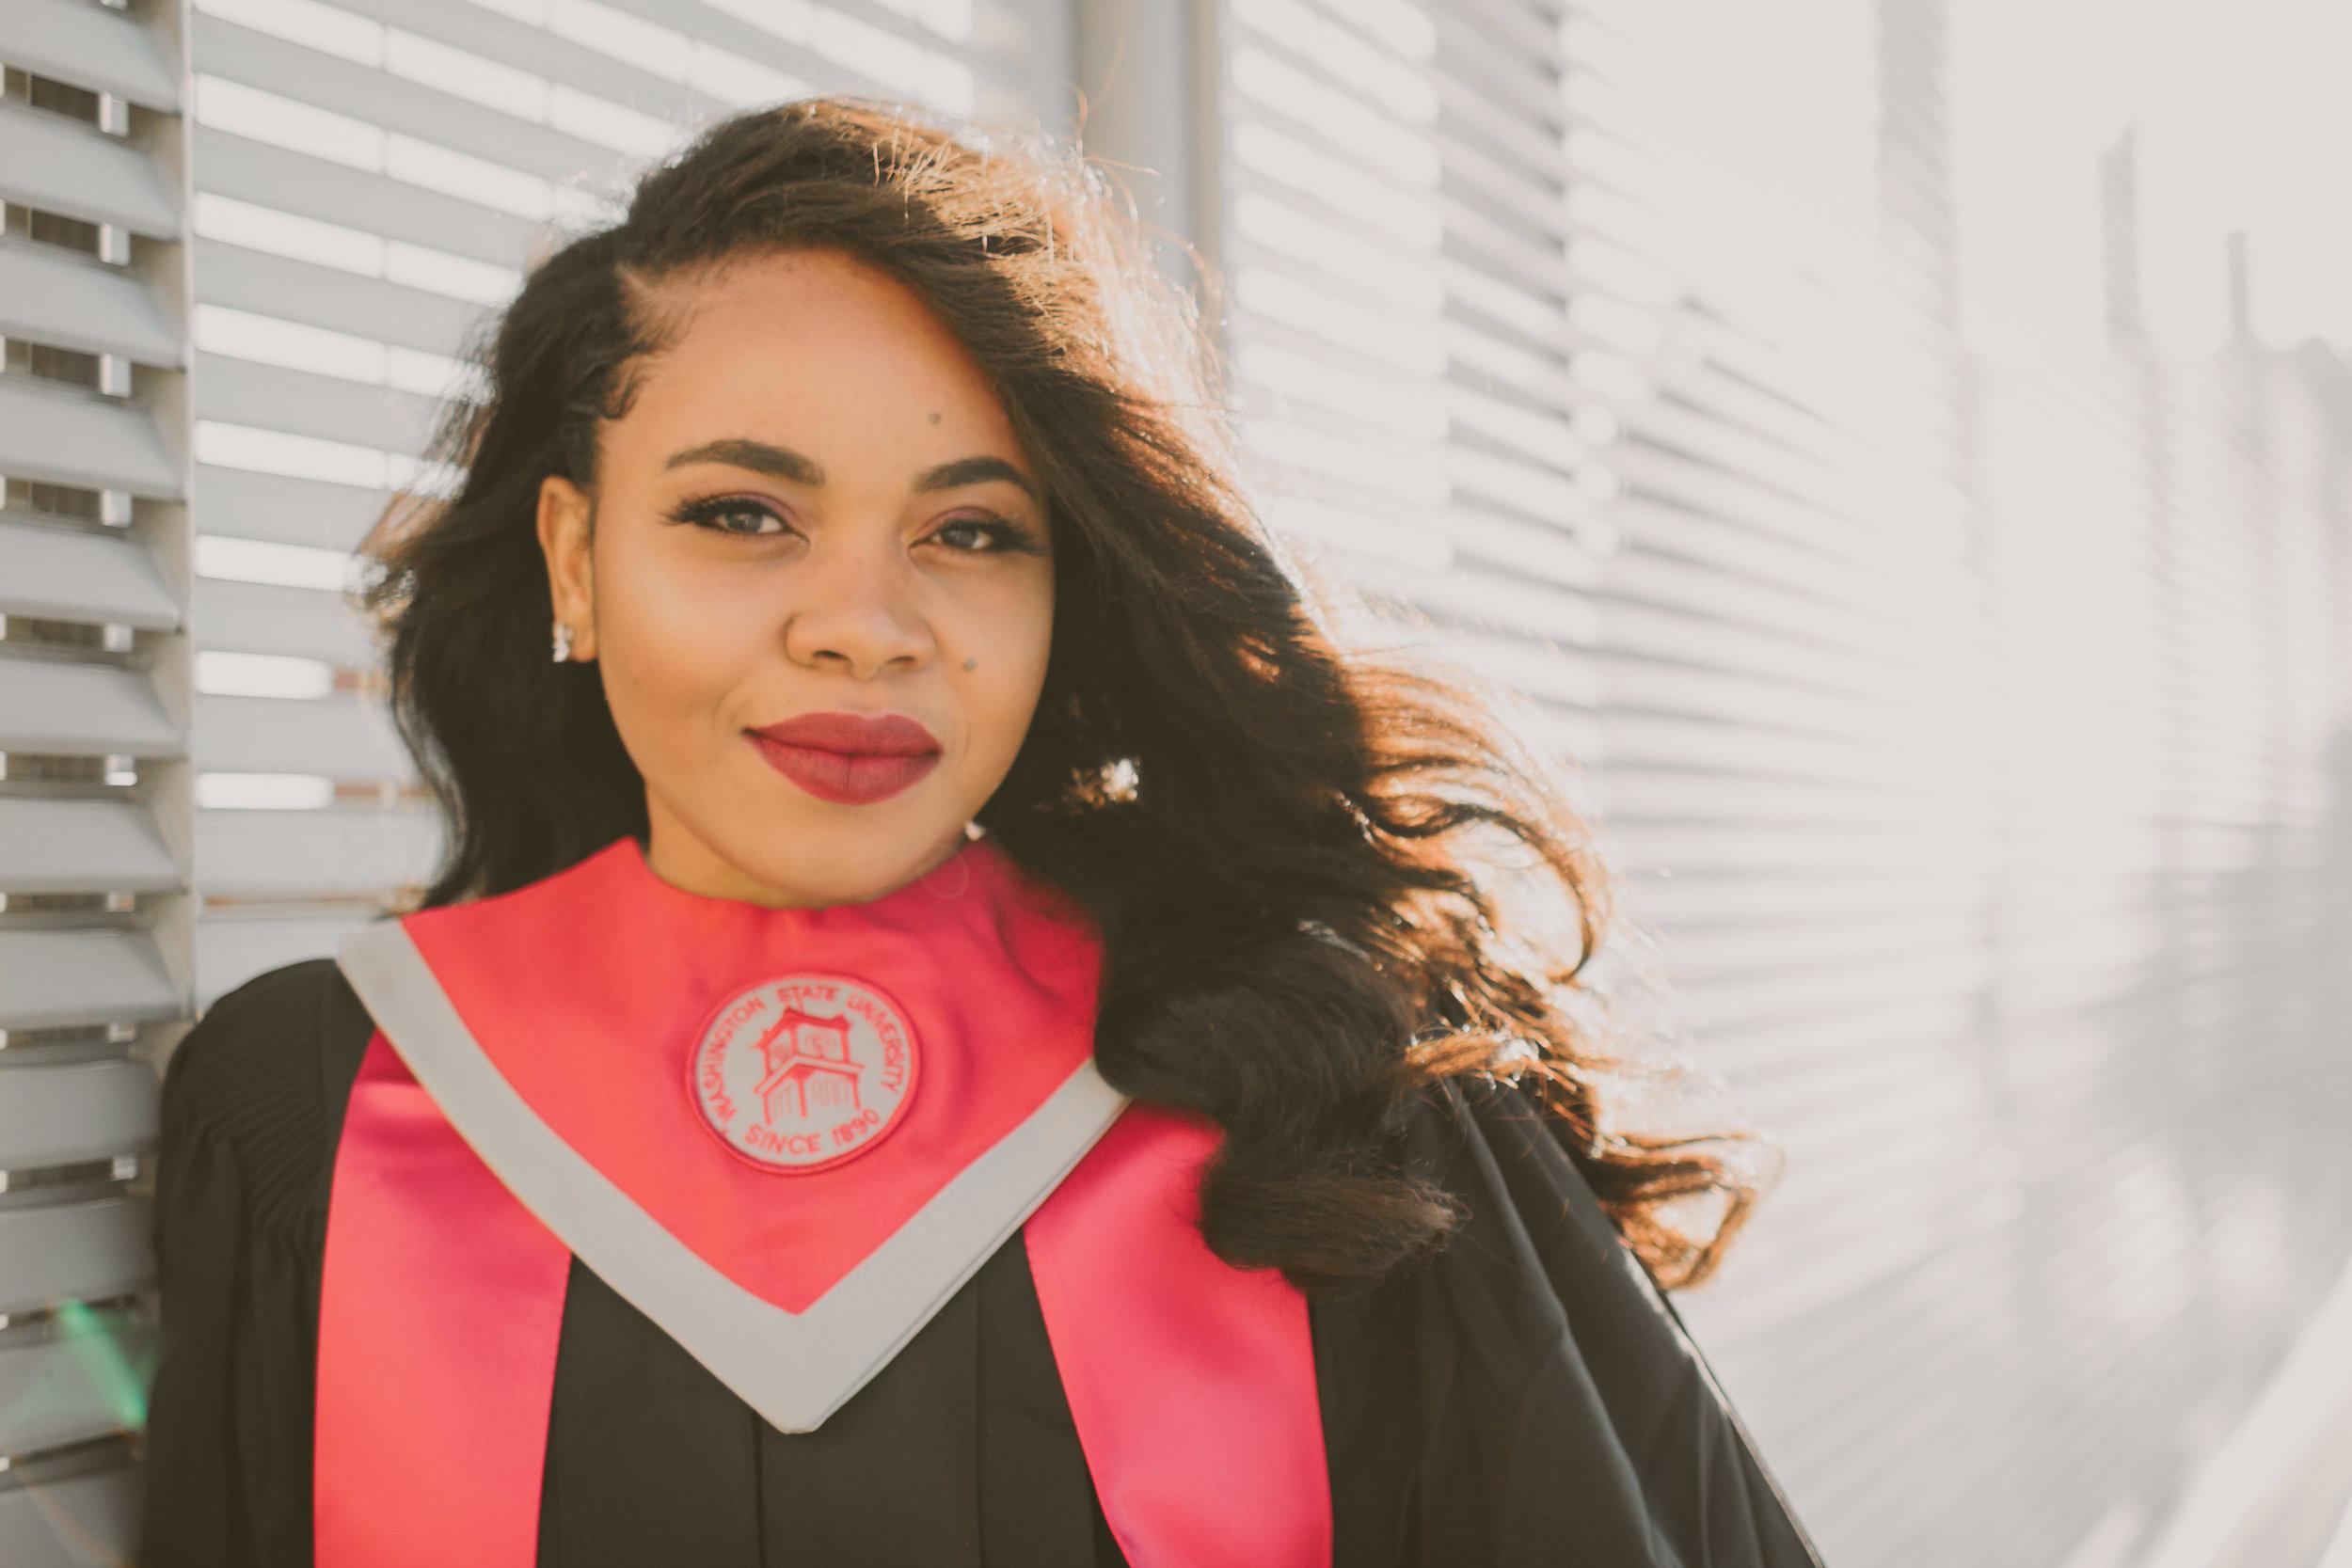 Ana_graduation-21.jpg